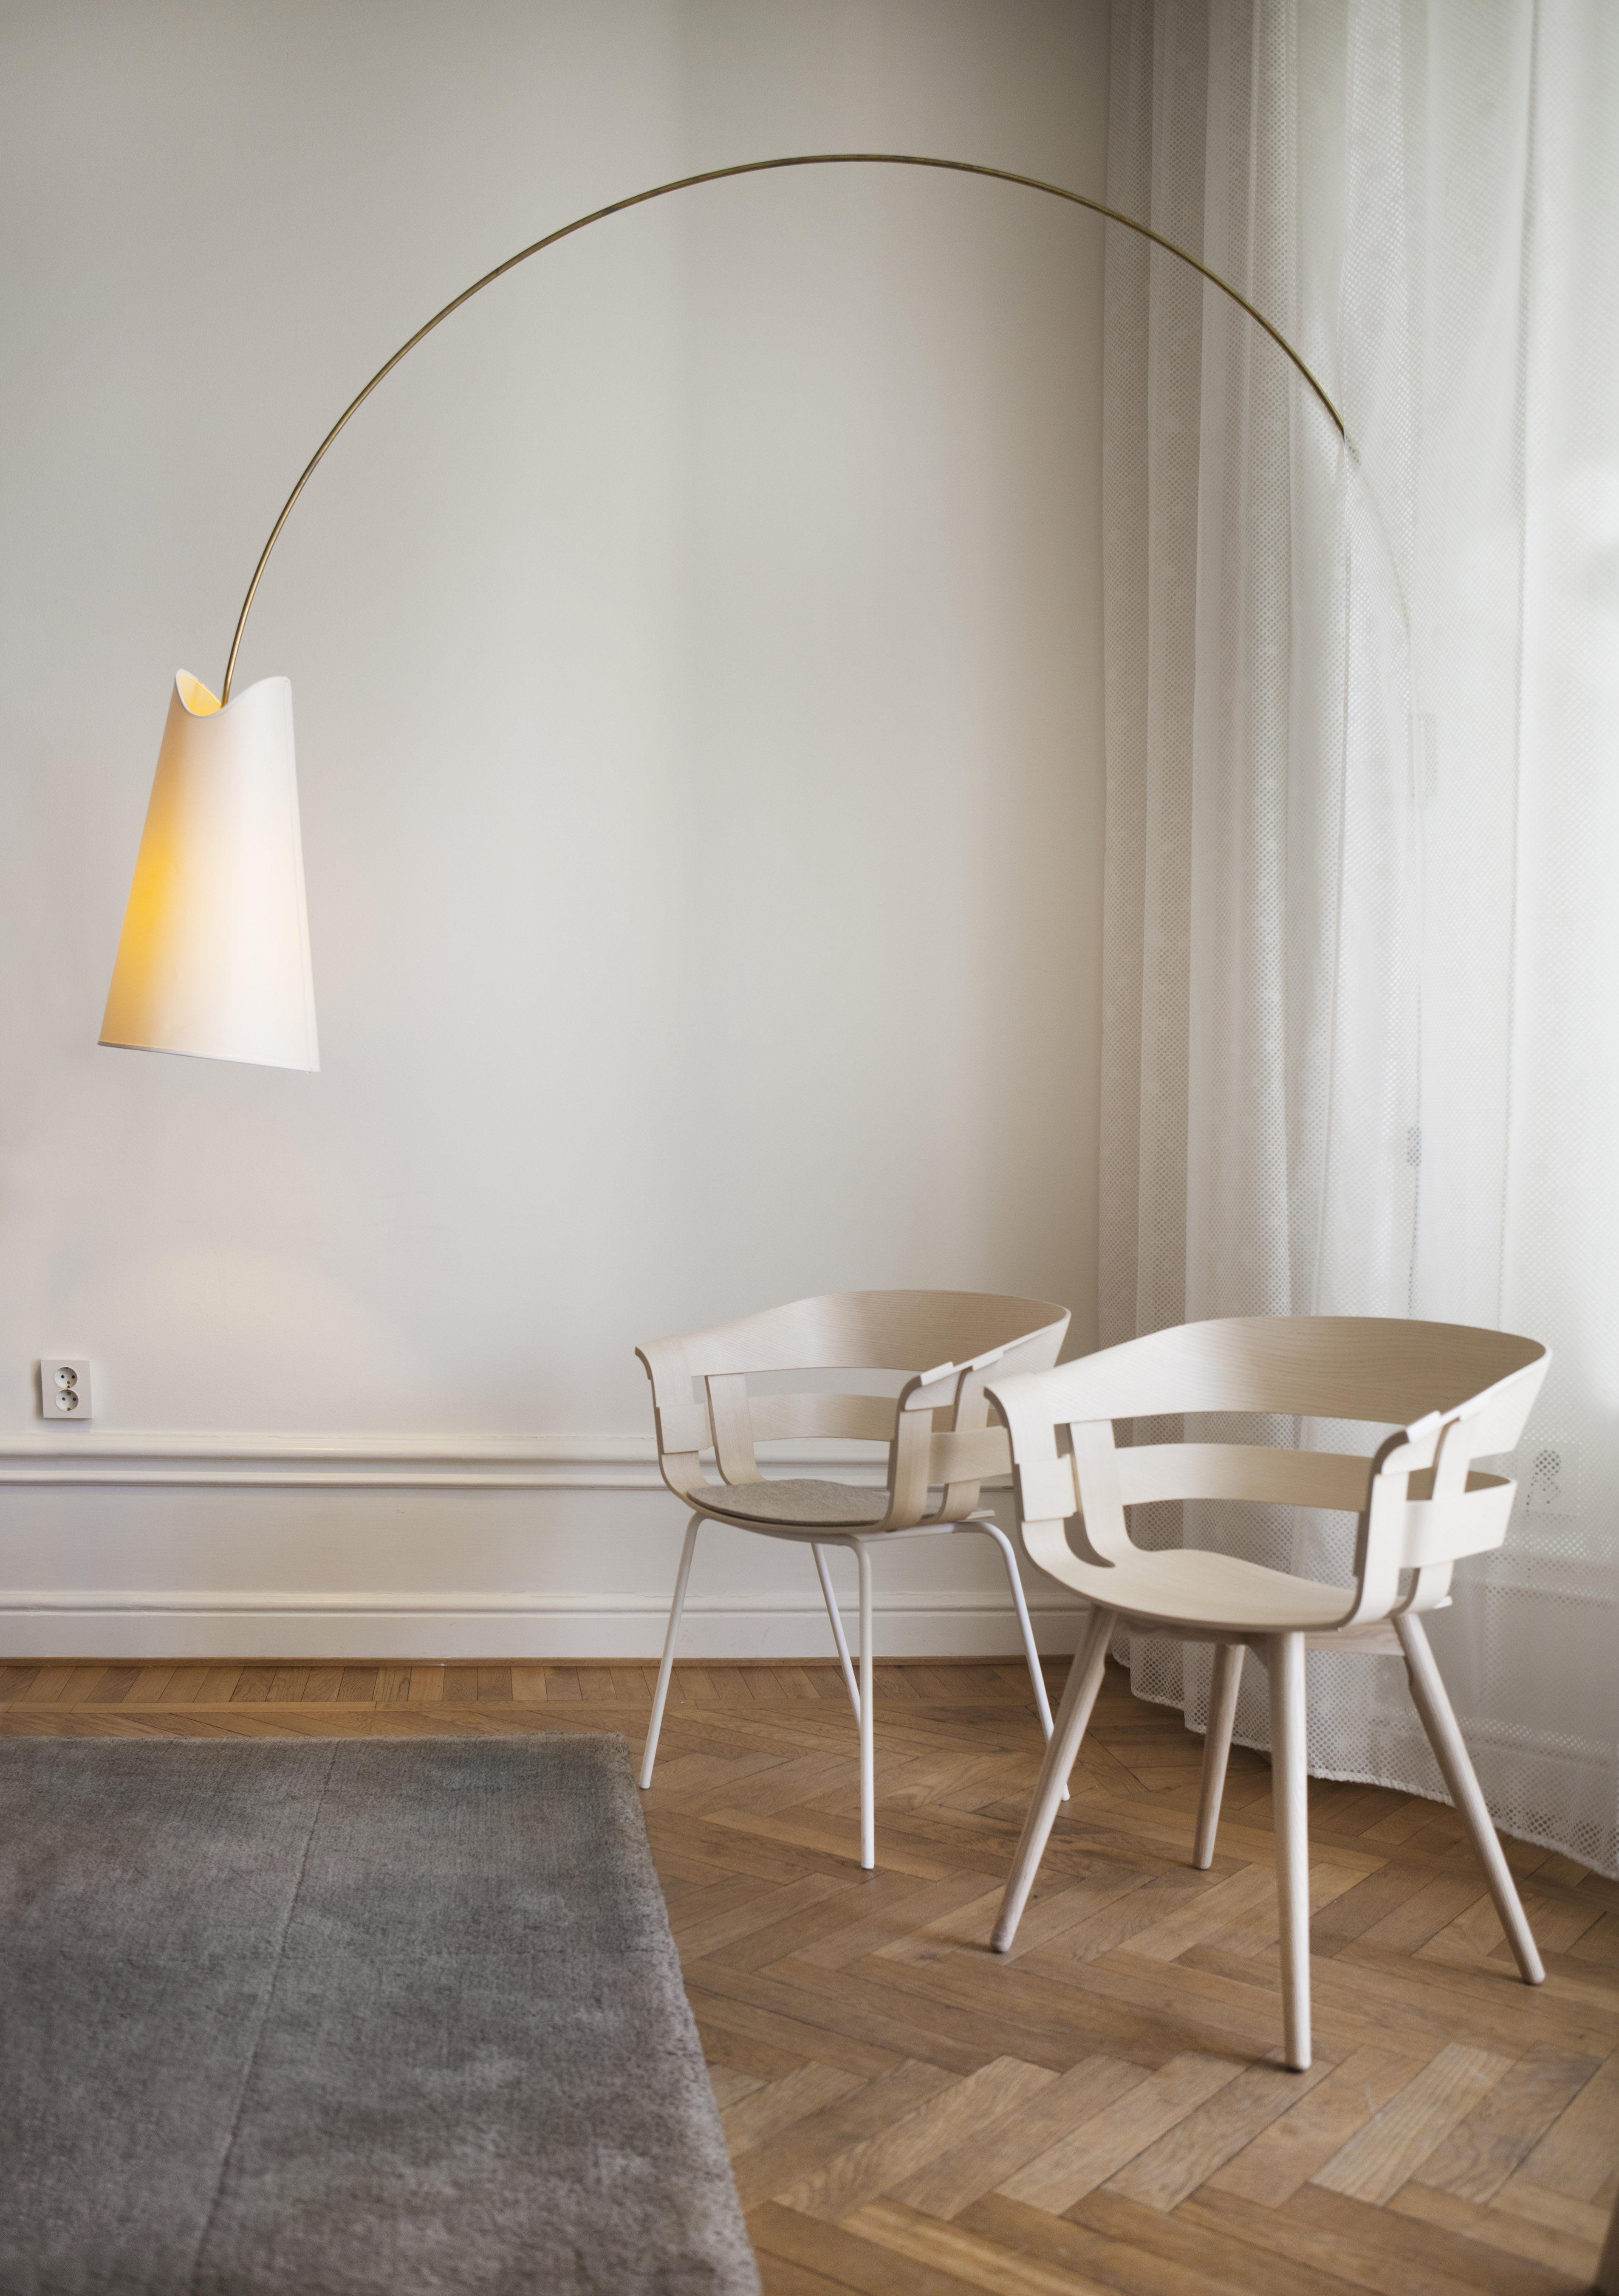 F r armlehnstuhl wick filz design house stockholm for Armlehnstuhl design